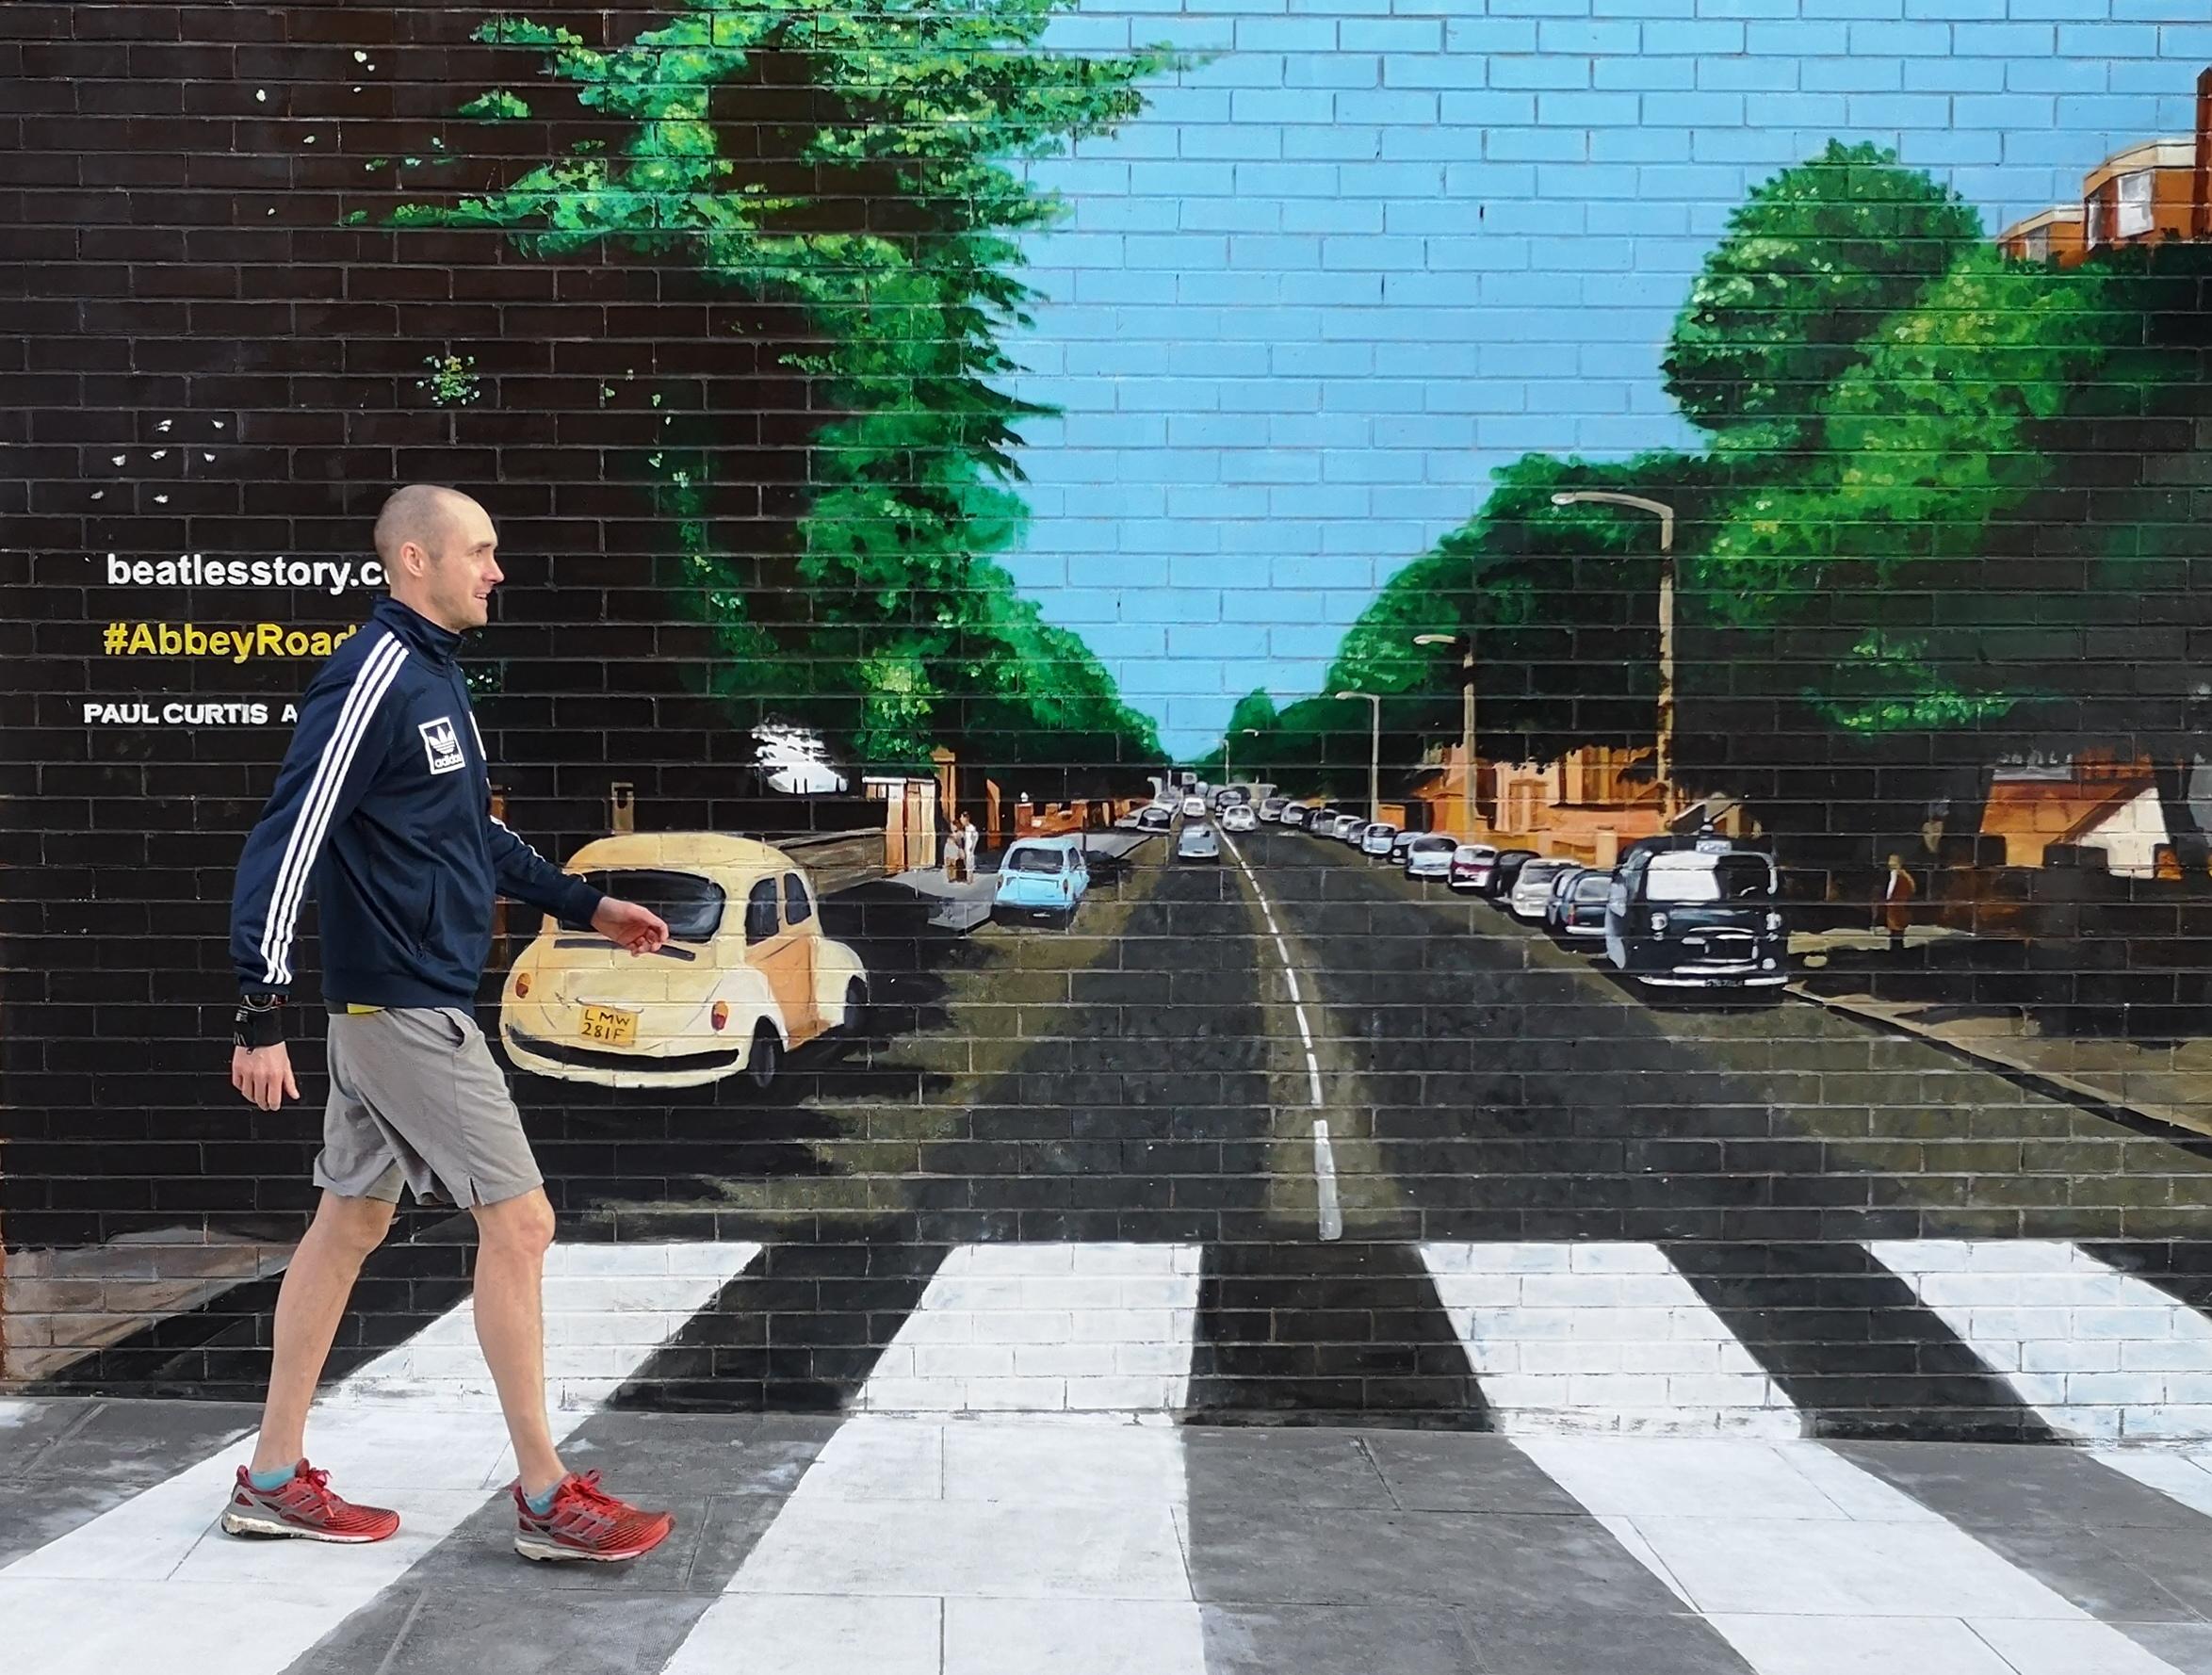 Paul Curtis, Abbey Road